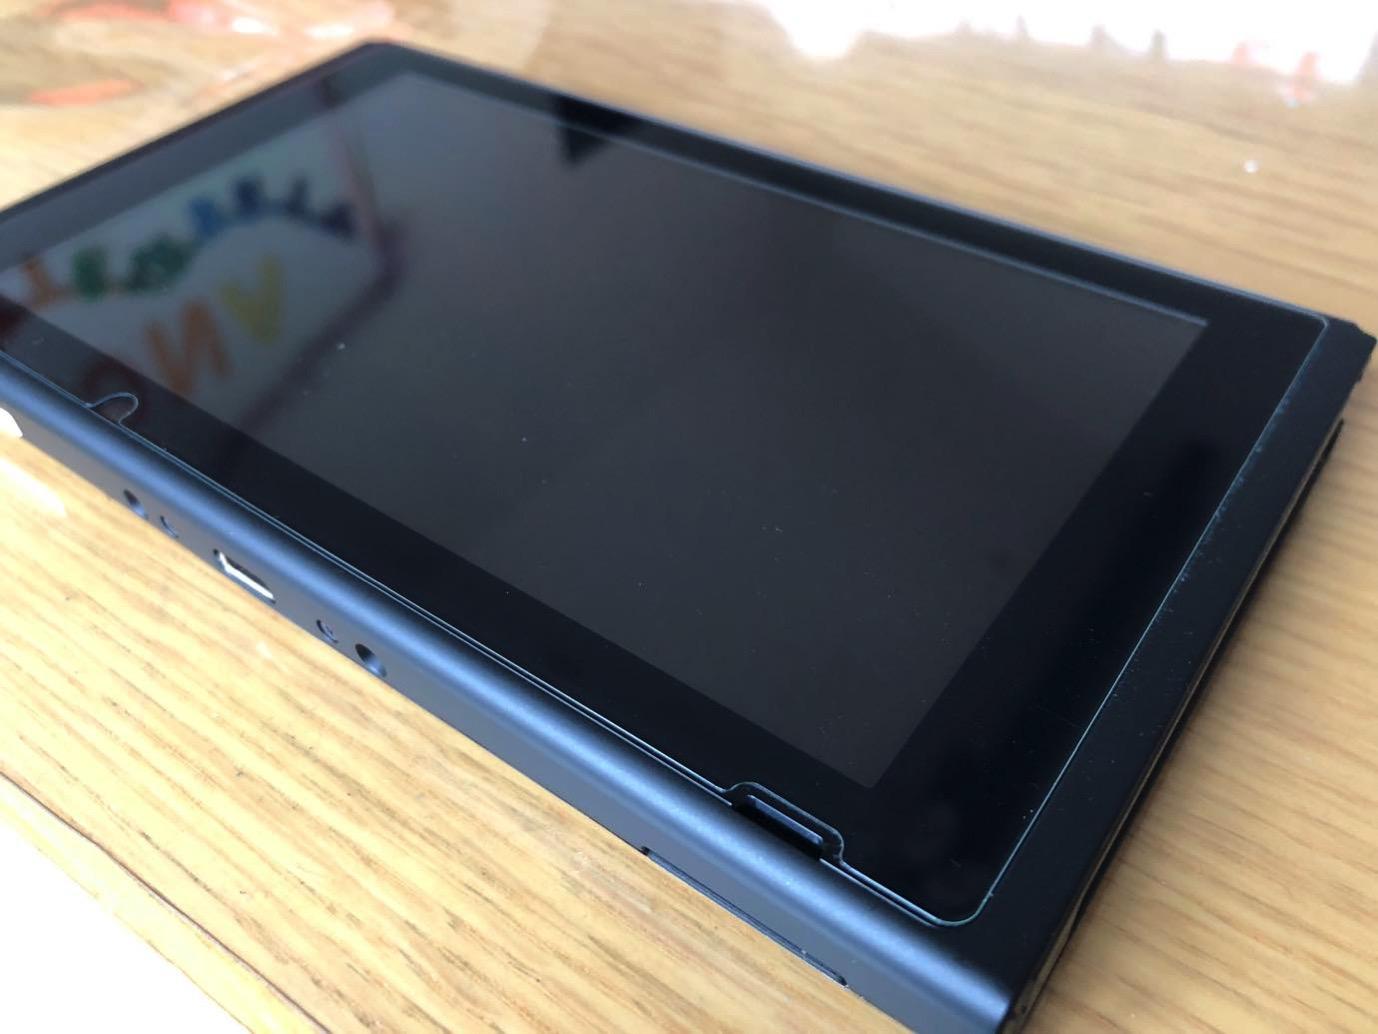 Nintendo Switch 保護ガラス 03 20171229 214959